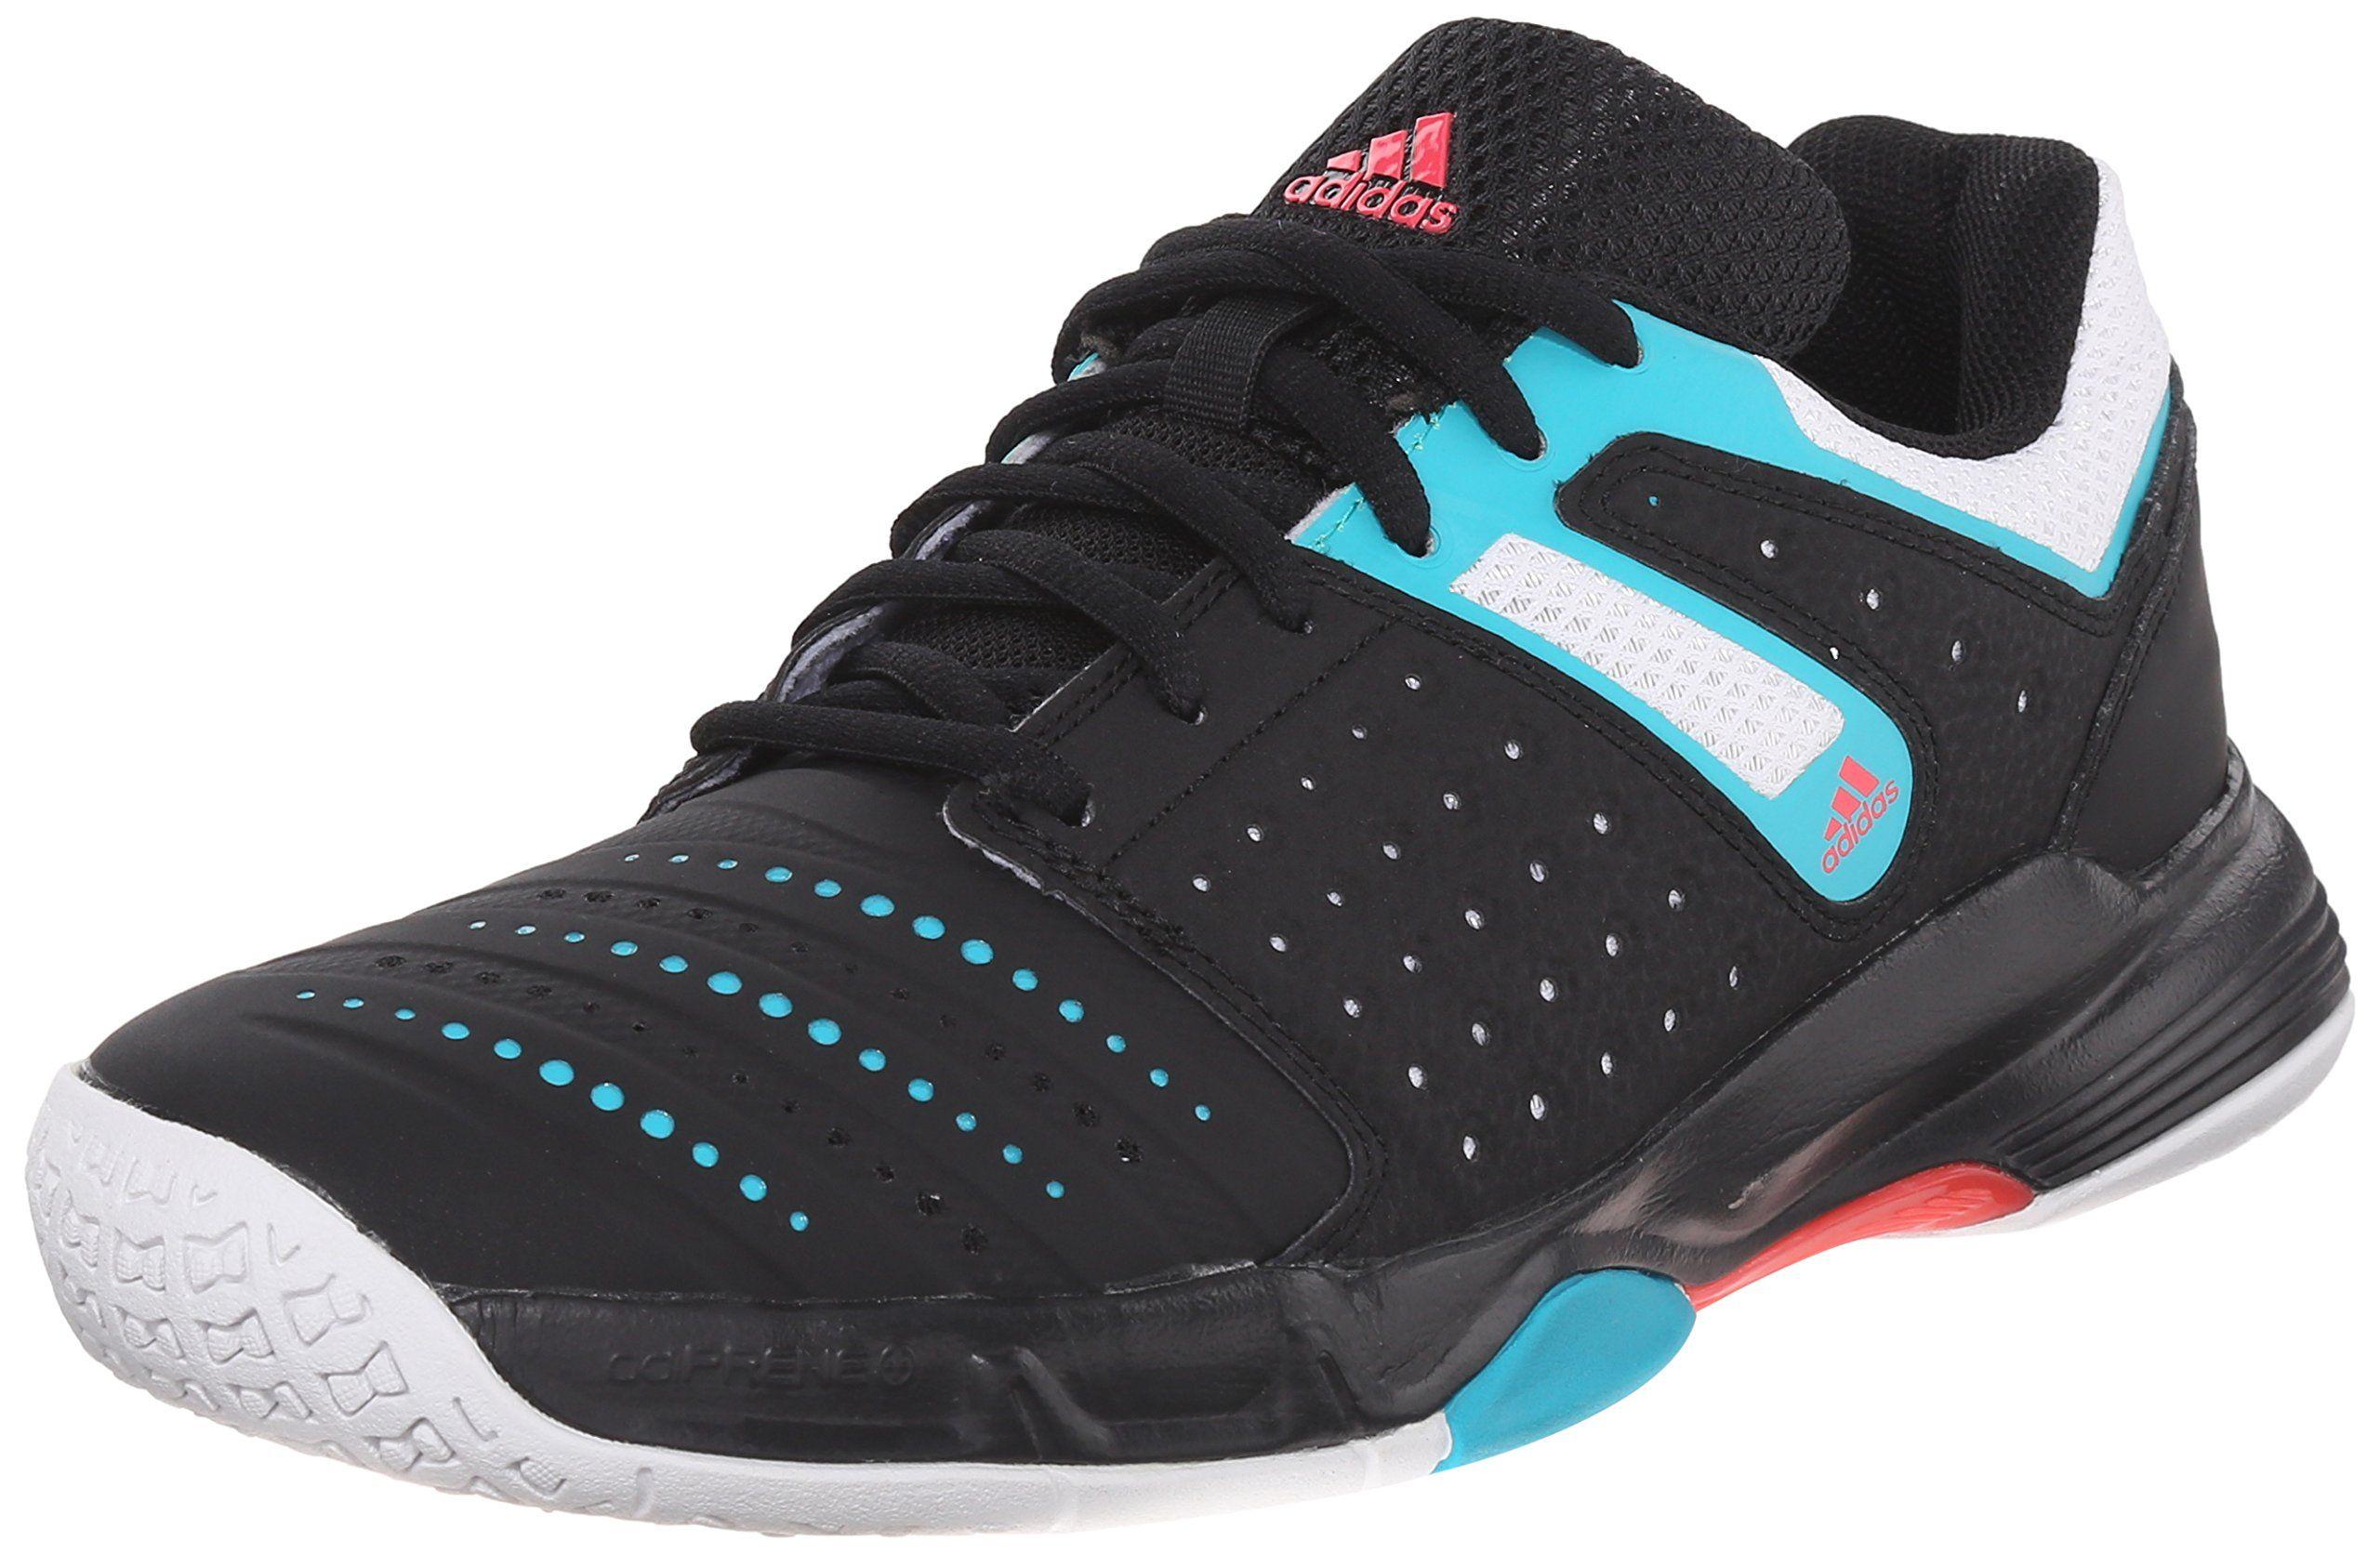 Adidas Performance Women S Court Stabil 12 W Volleyball Shoe Black White Shock Green 8 M Us Volleybal Volleyball Shoes Womens Athletic Shoes Discount Adidas